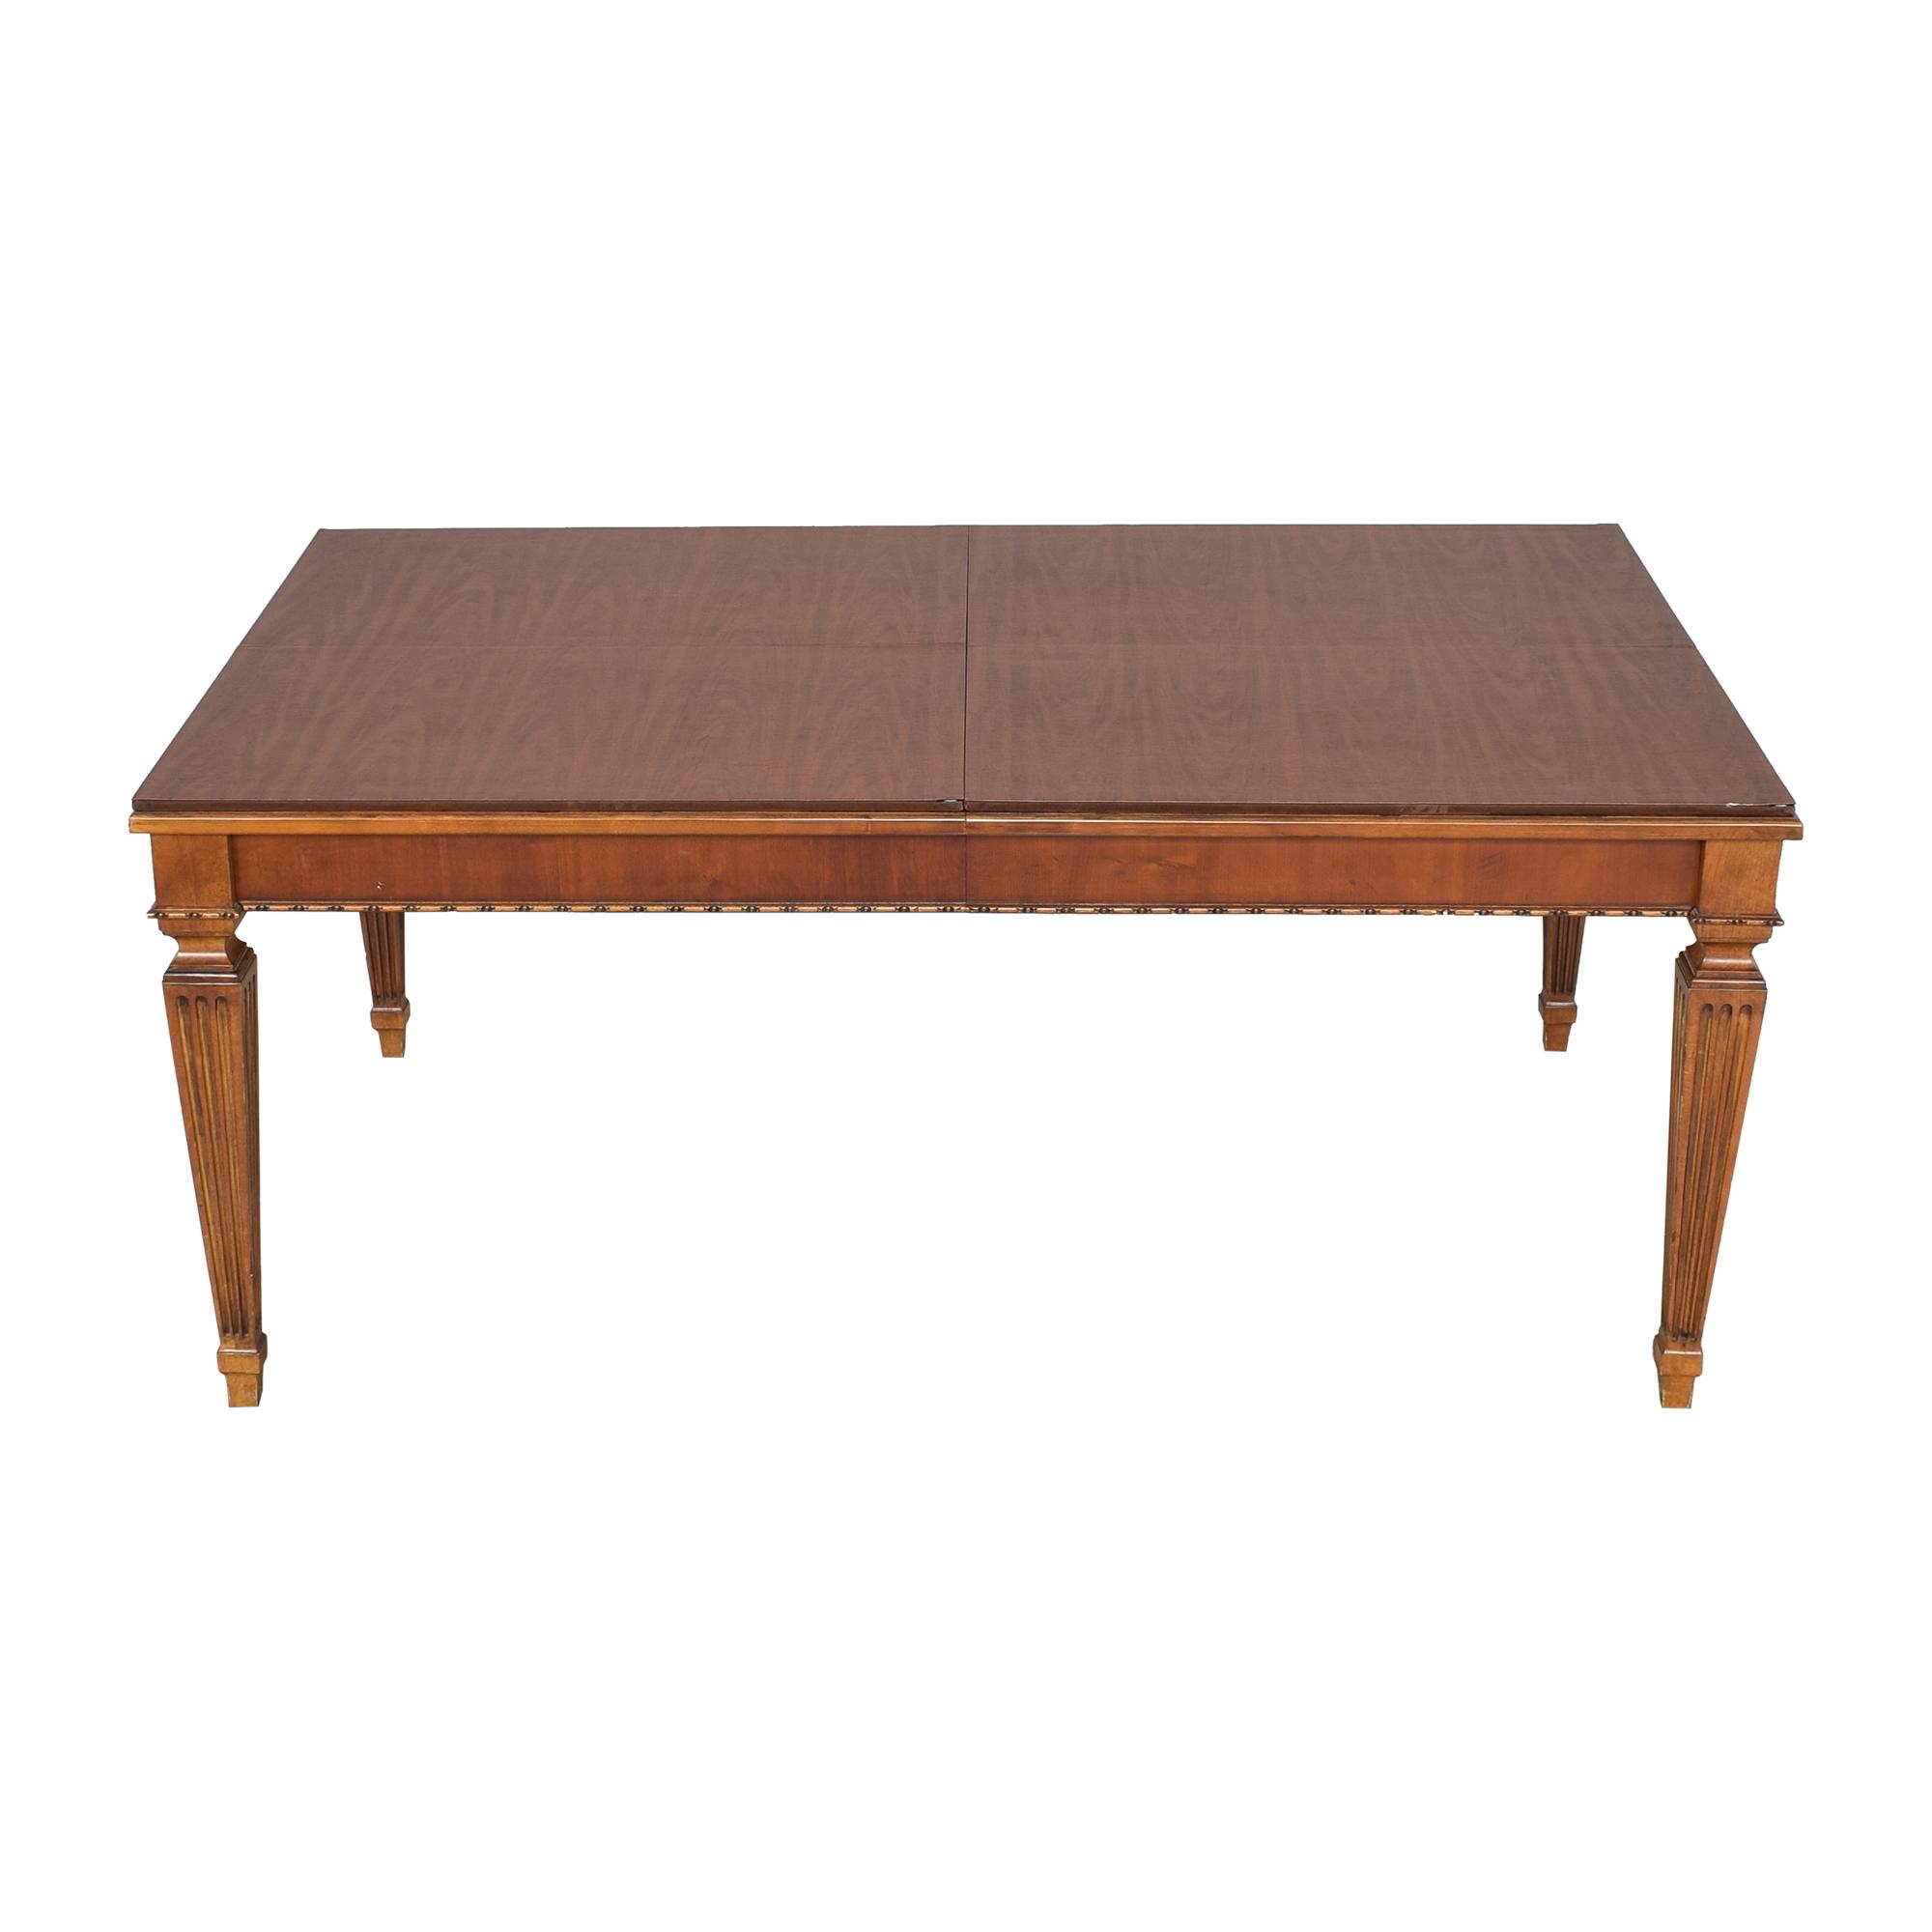 buy Ethan Allen Ethan Allen Goodwin Extendable Dining Table online